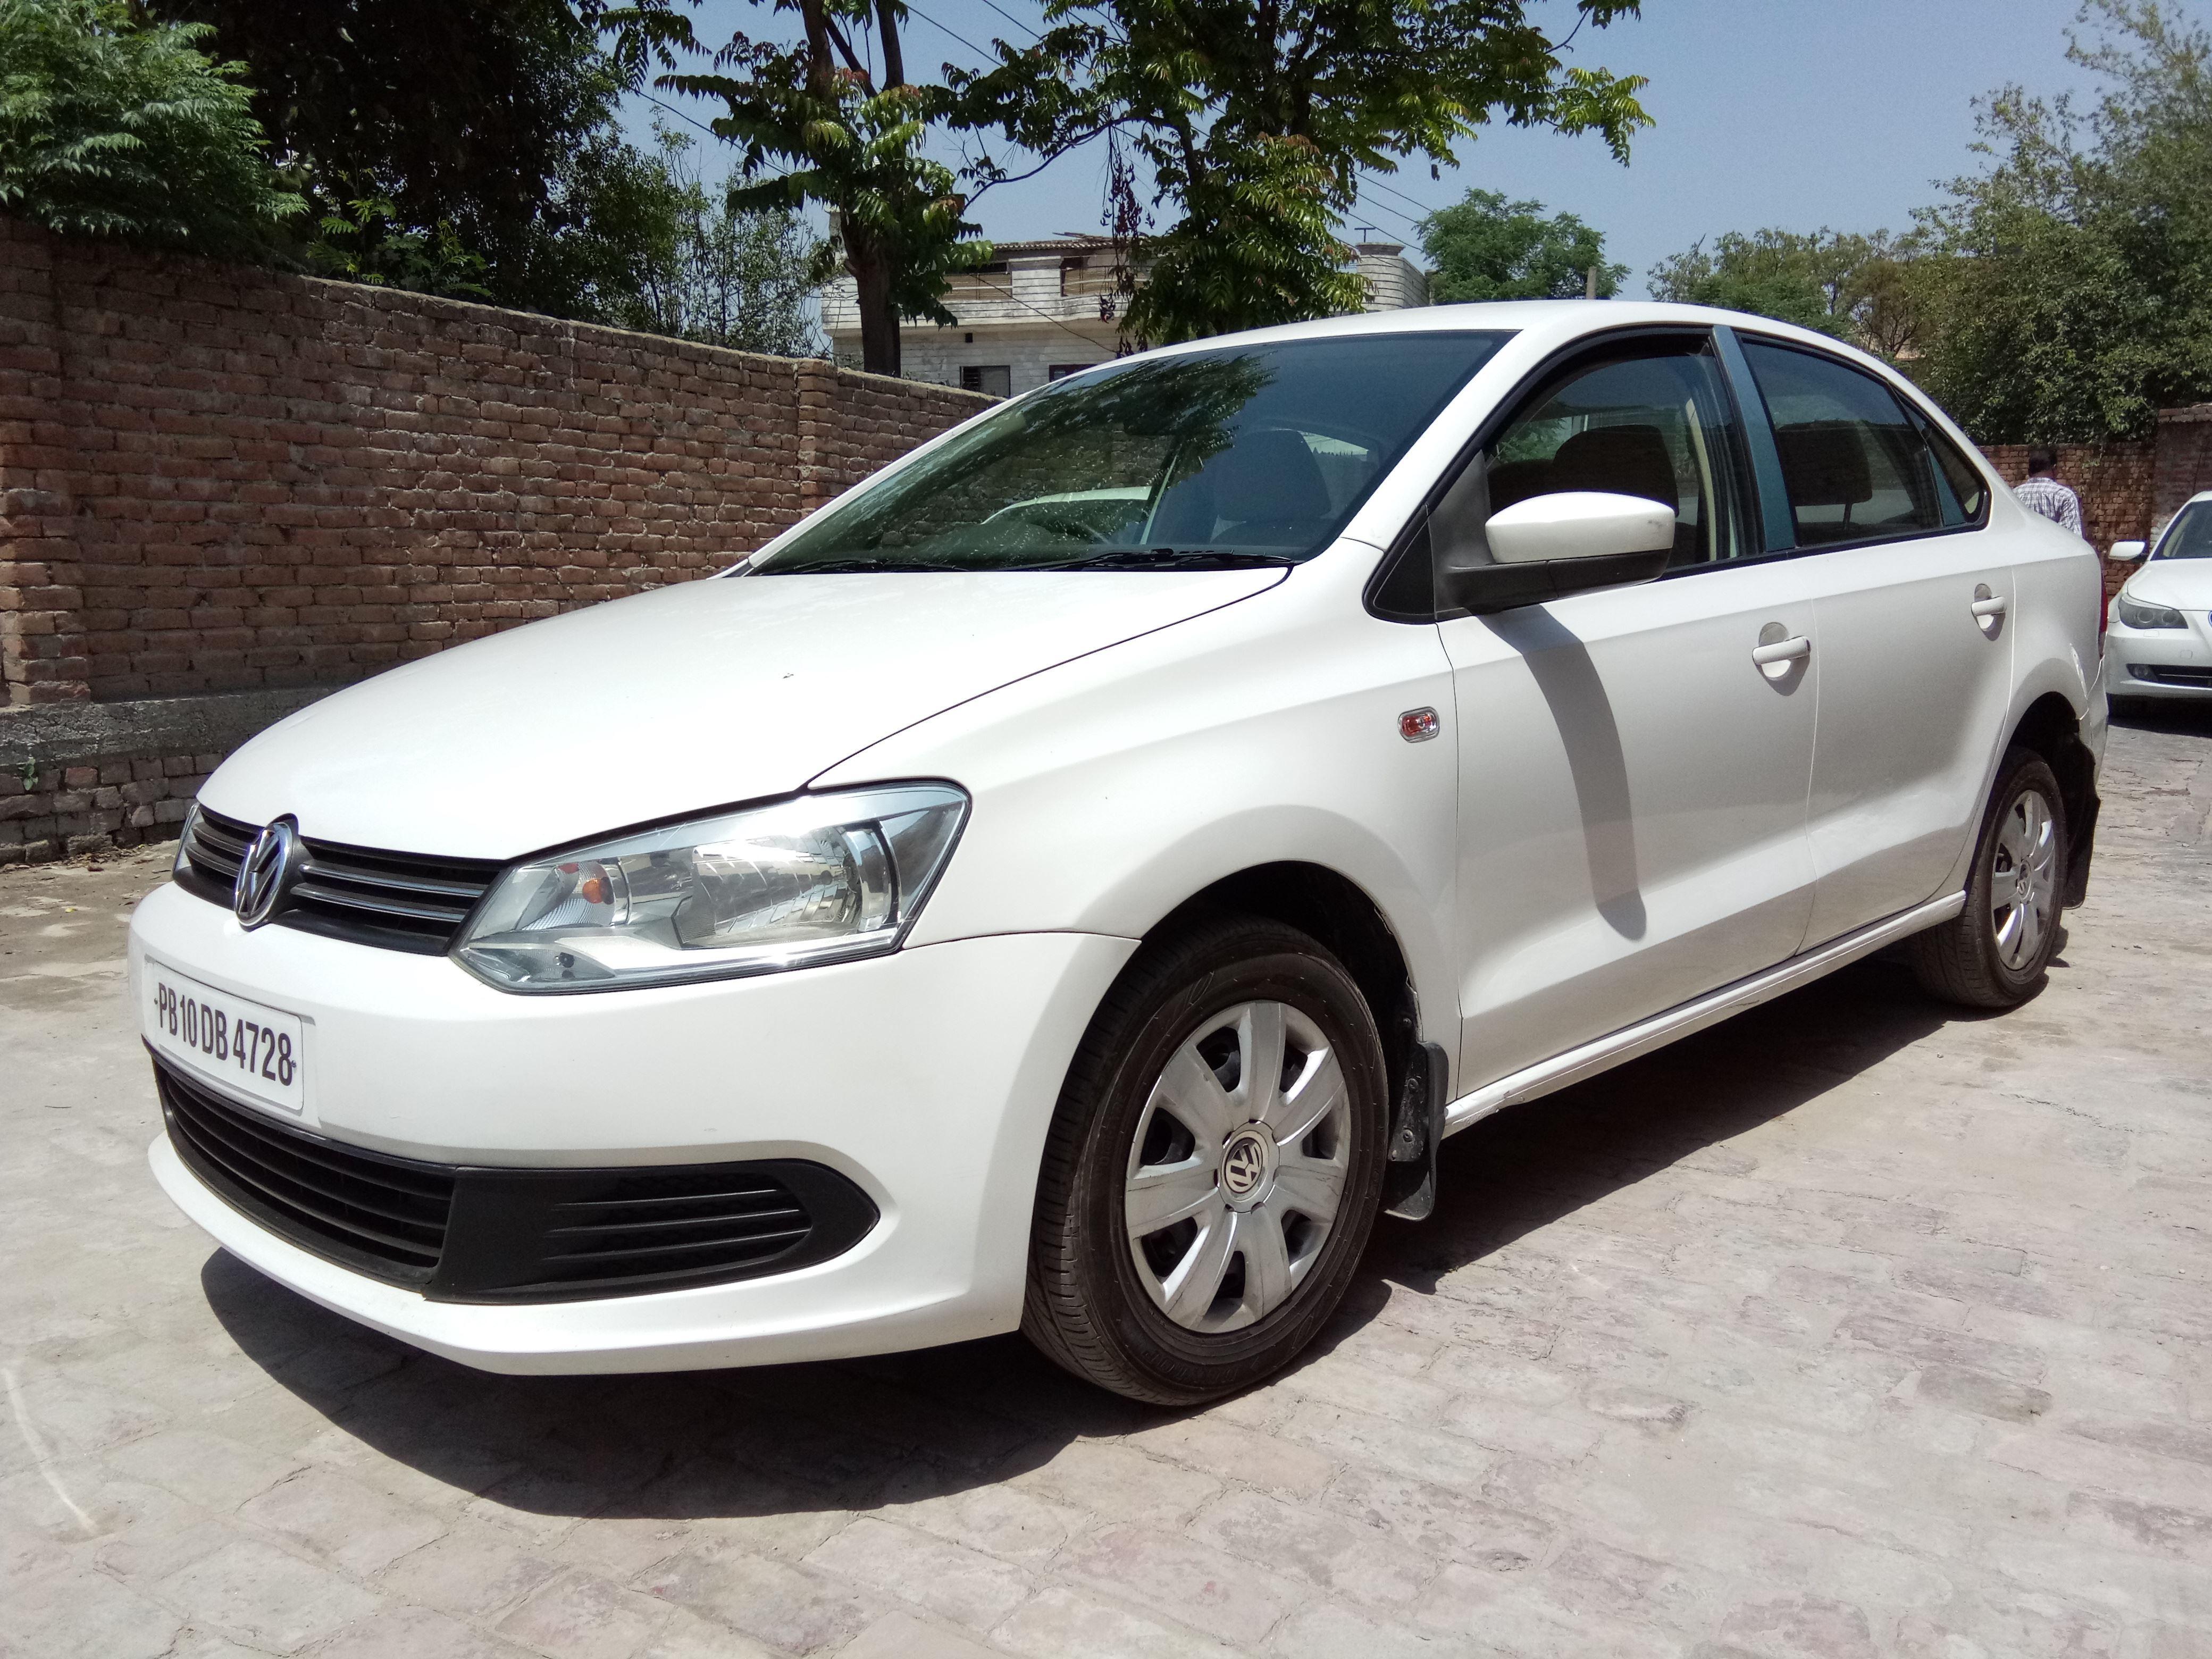 Volkswagen Vento Trendline Petrol - Mahindra First Choice